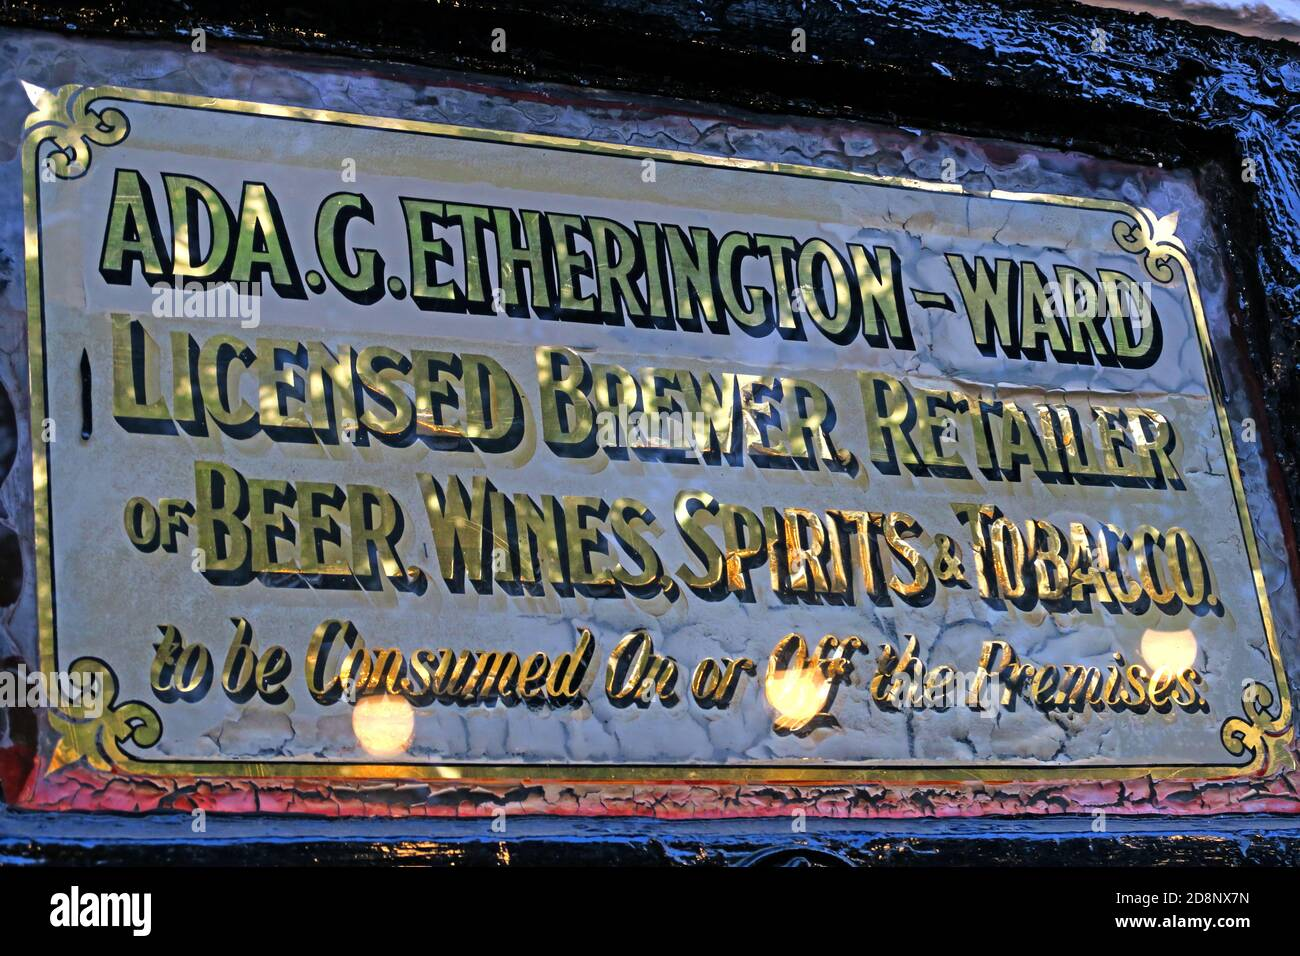 HotpixUK,@HotpixUK,GoTonySmith,UK,England,Great Britain,GB,Nottingham,pub,bar,CAMRA,listed building,oldest bar,old,historic,dusk,evening,sign,city centre,Nottingham city centre,Notts,Nottinghamshire,NG1,east Midlands,Oldest Inn In England,medieval,historic building,1189,Castle Rock,Nottingham Castle,brewhouse,1799,The Pilgrim,the Trip,Brew House Yard,Nottingham Castle Brewhouse,Ye Old Trip,Oldest pub,licensee,landlady